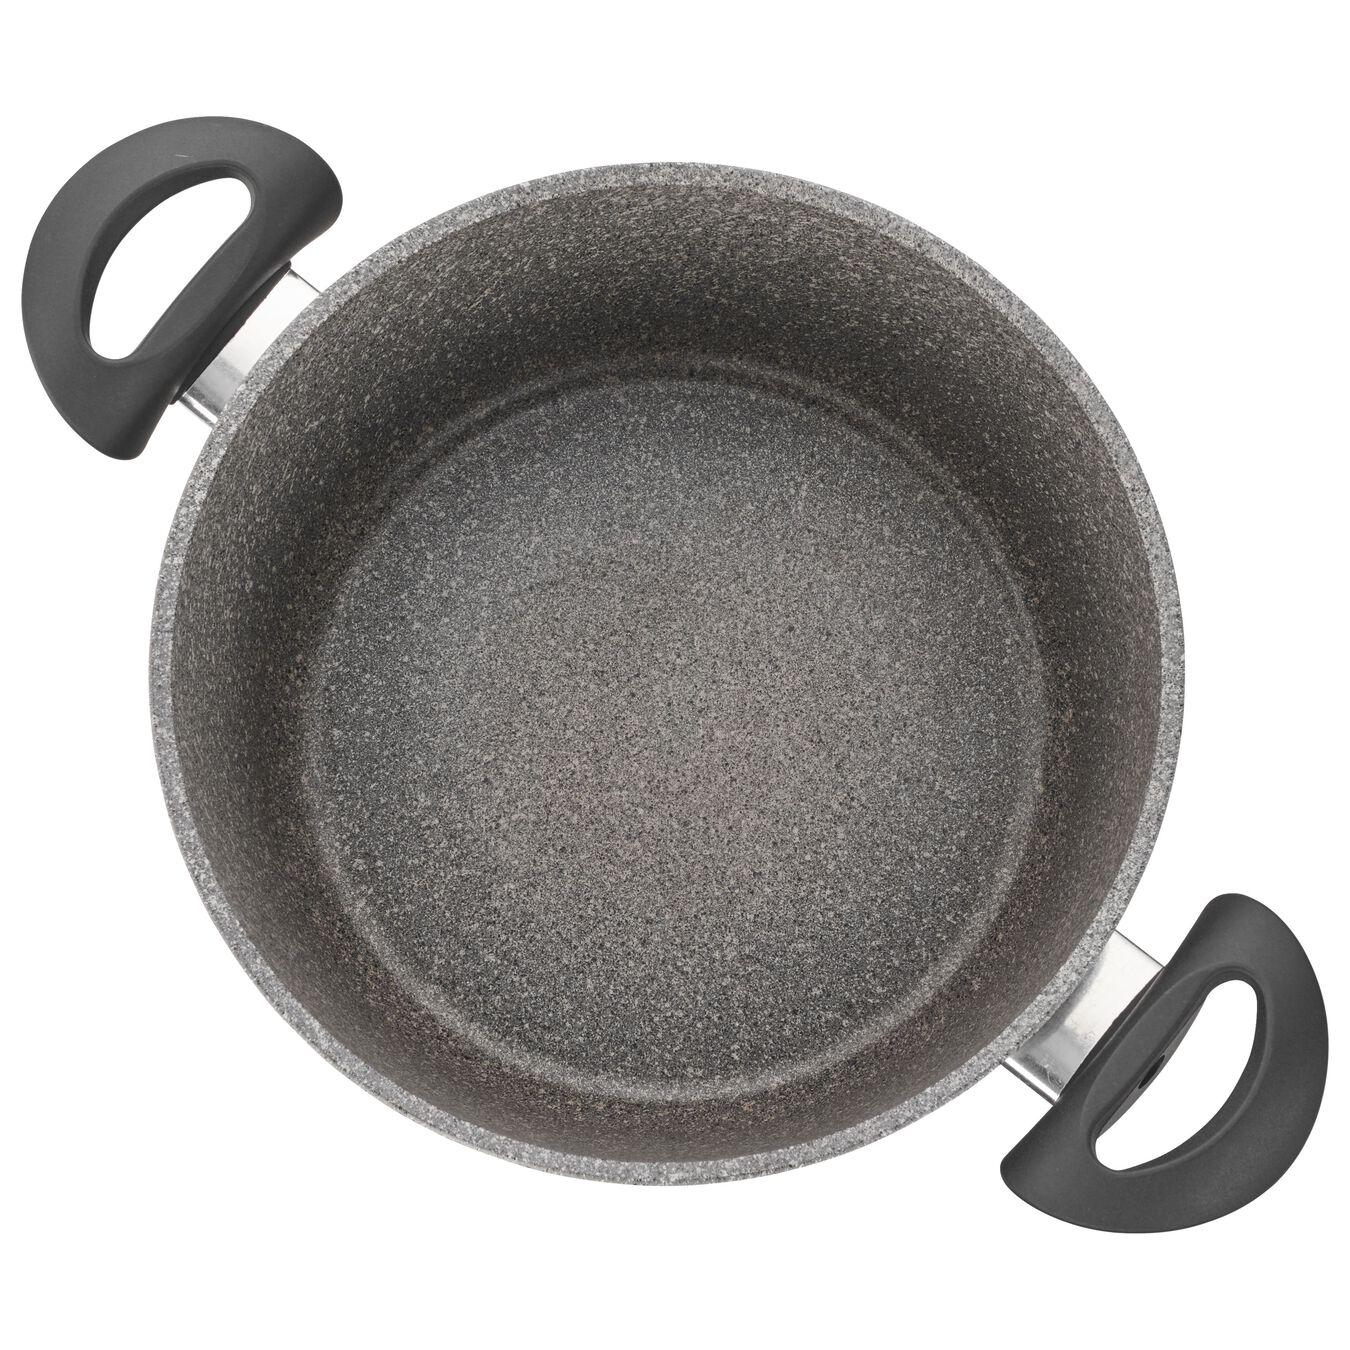 152.25 oz, round, Cocotte,,large 1